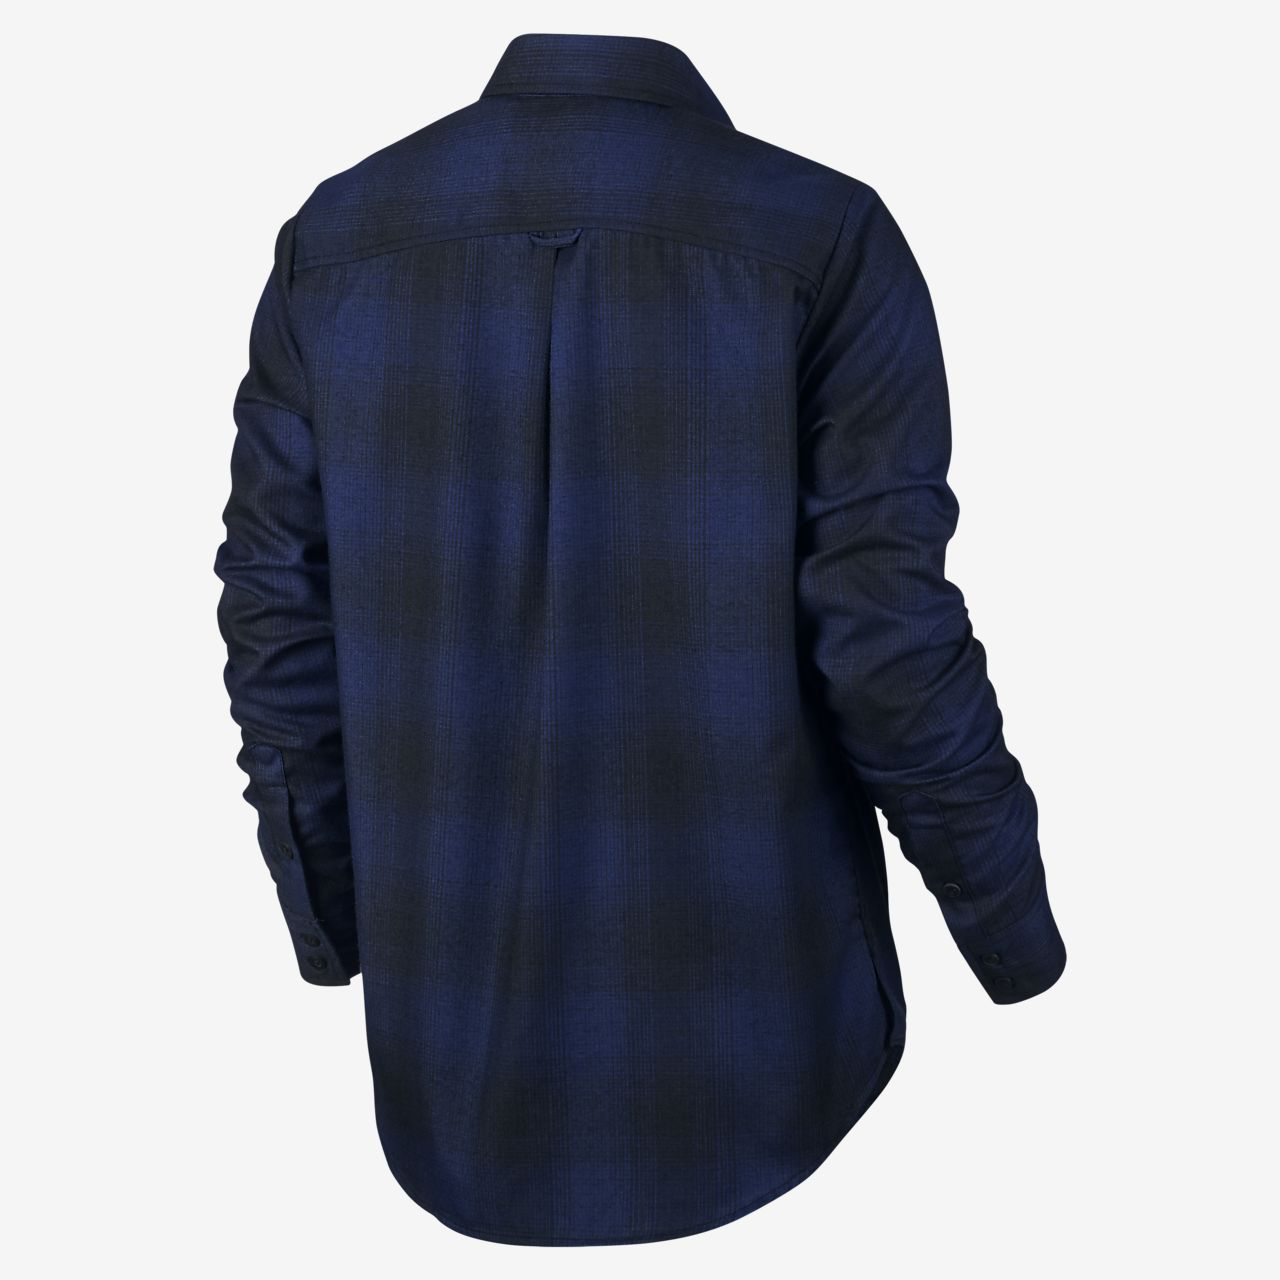 ... Hurley Dri-FIT Wilson Flannel Women's Long Sleeve Shirt